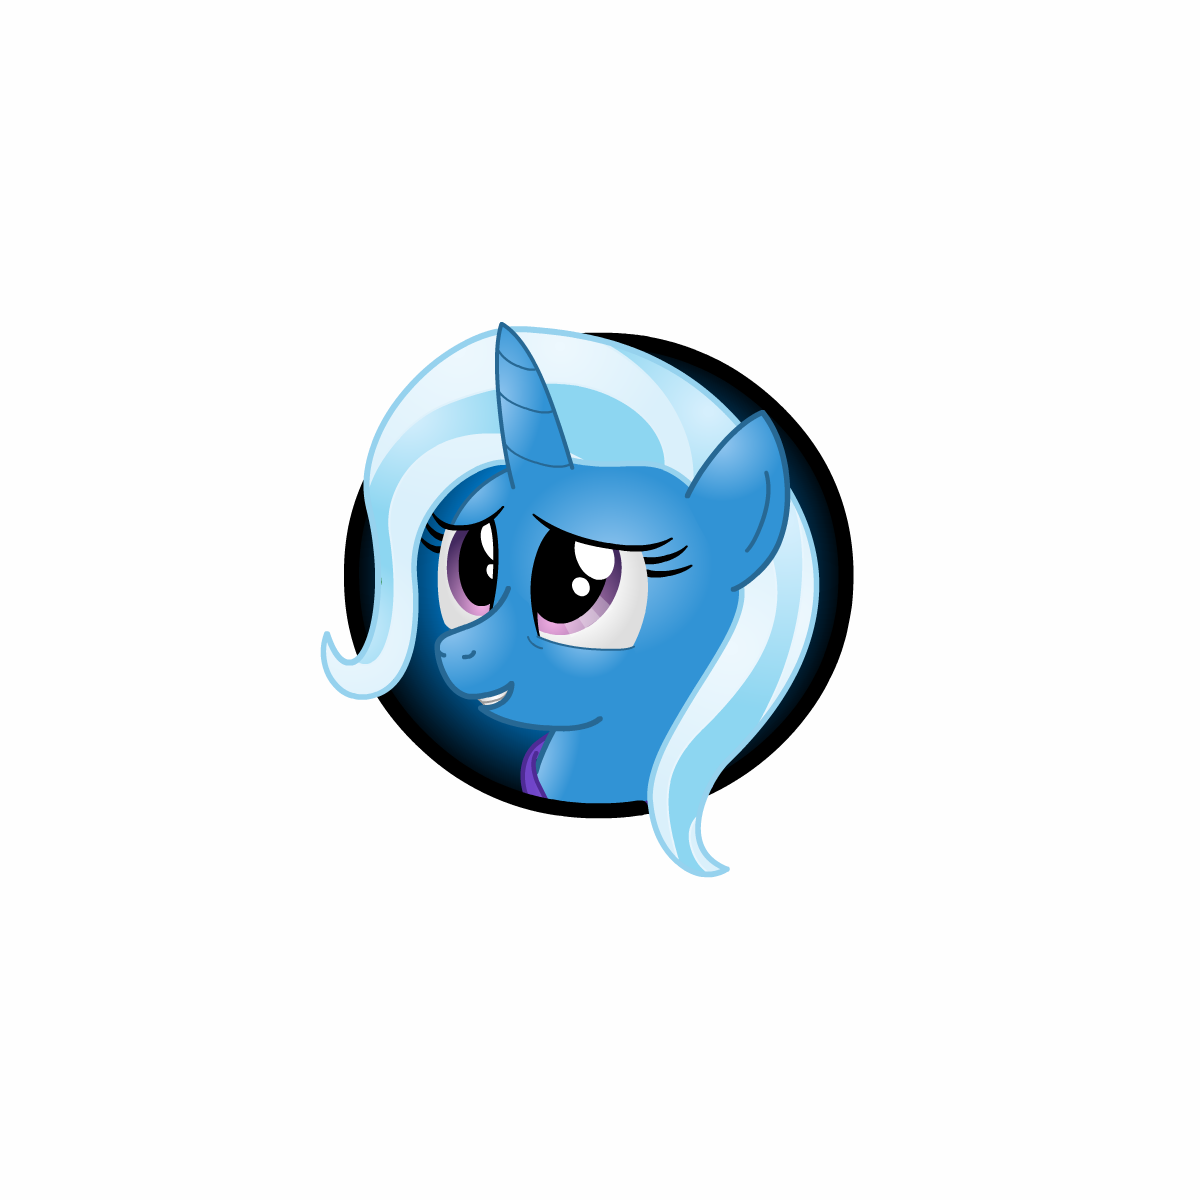 Trixie Icon by Lakword